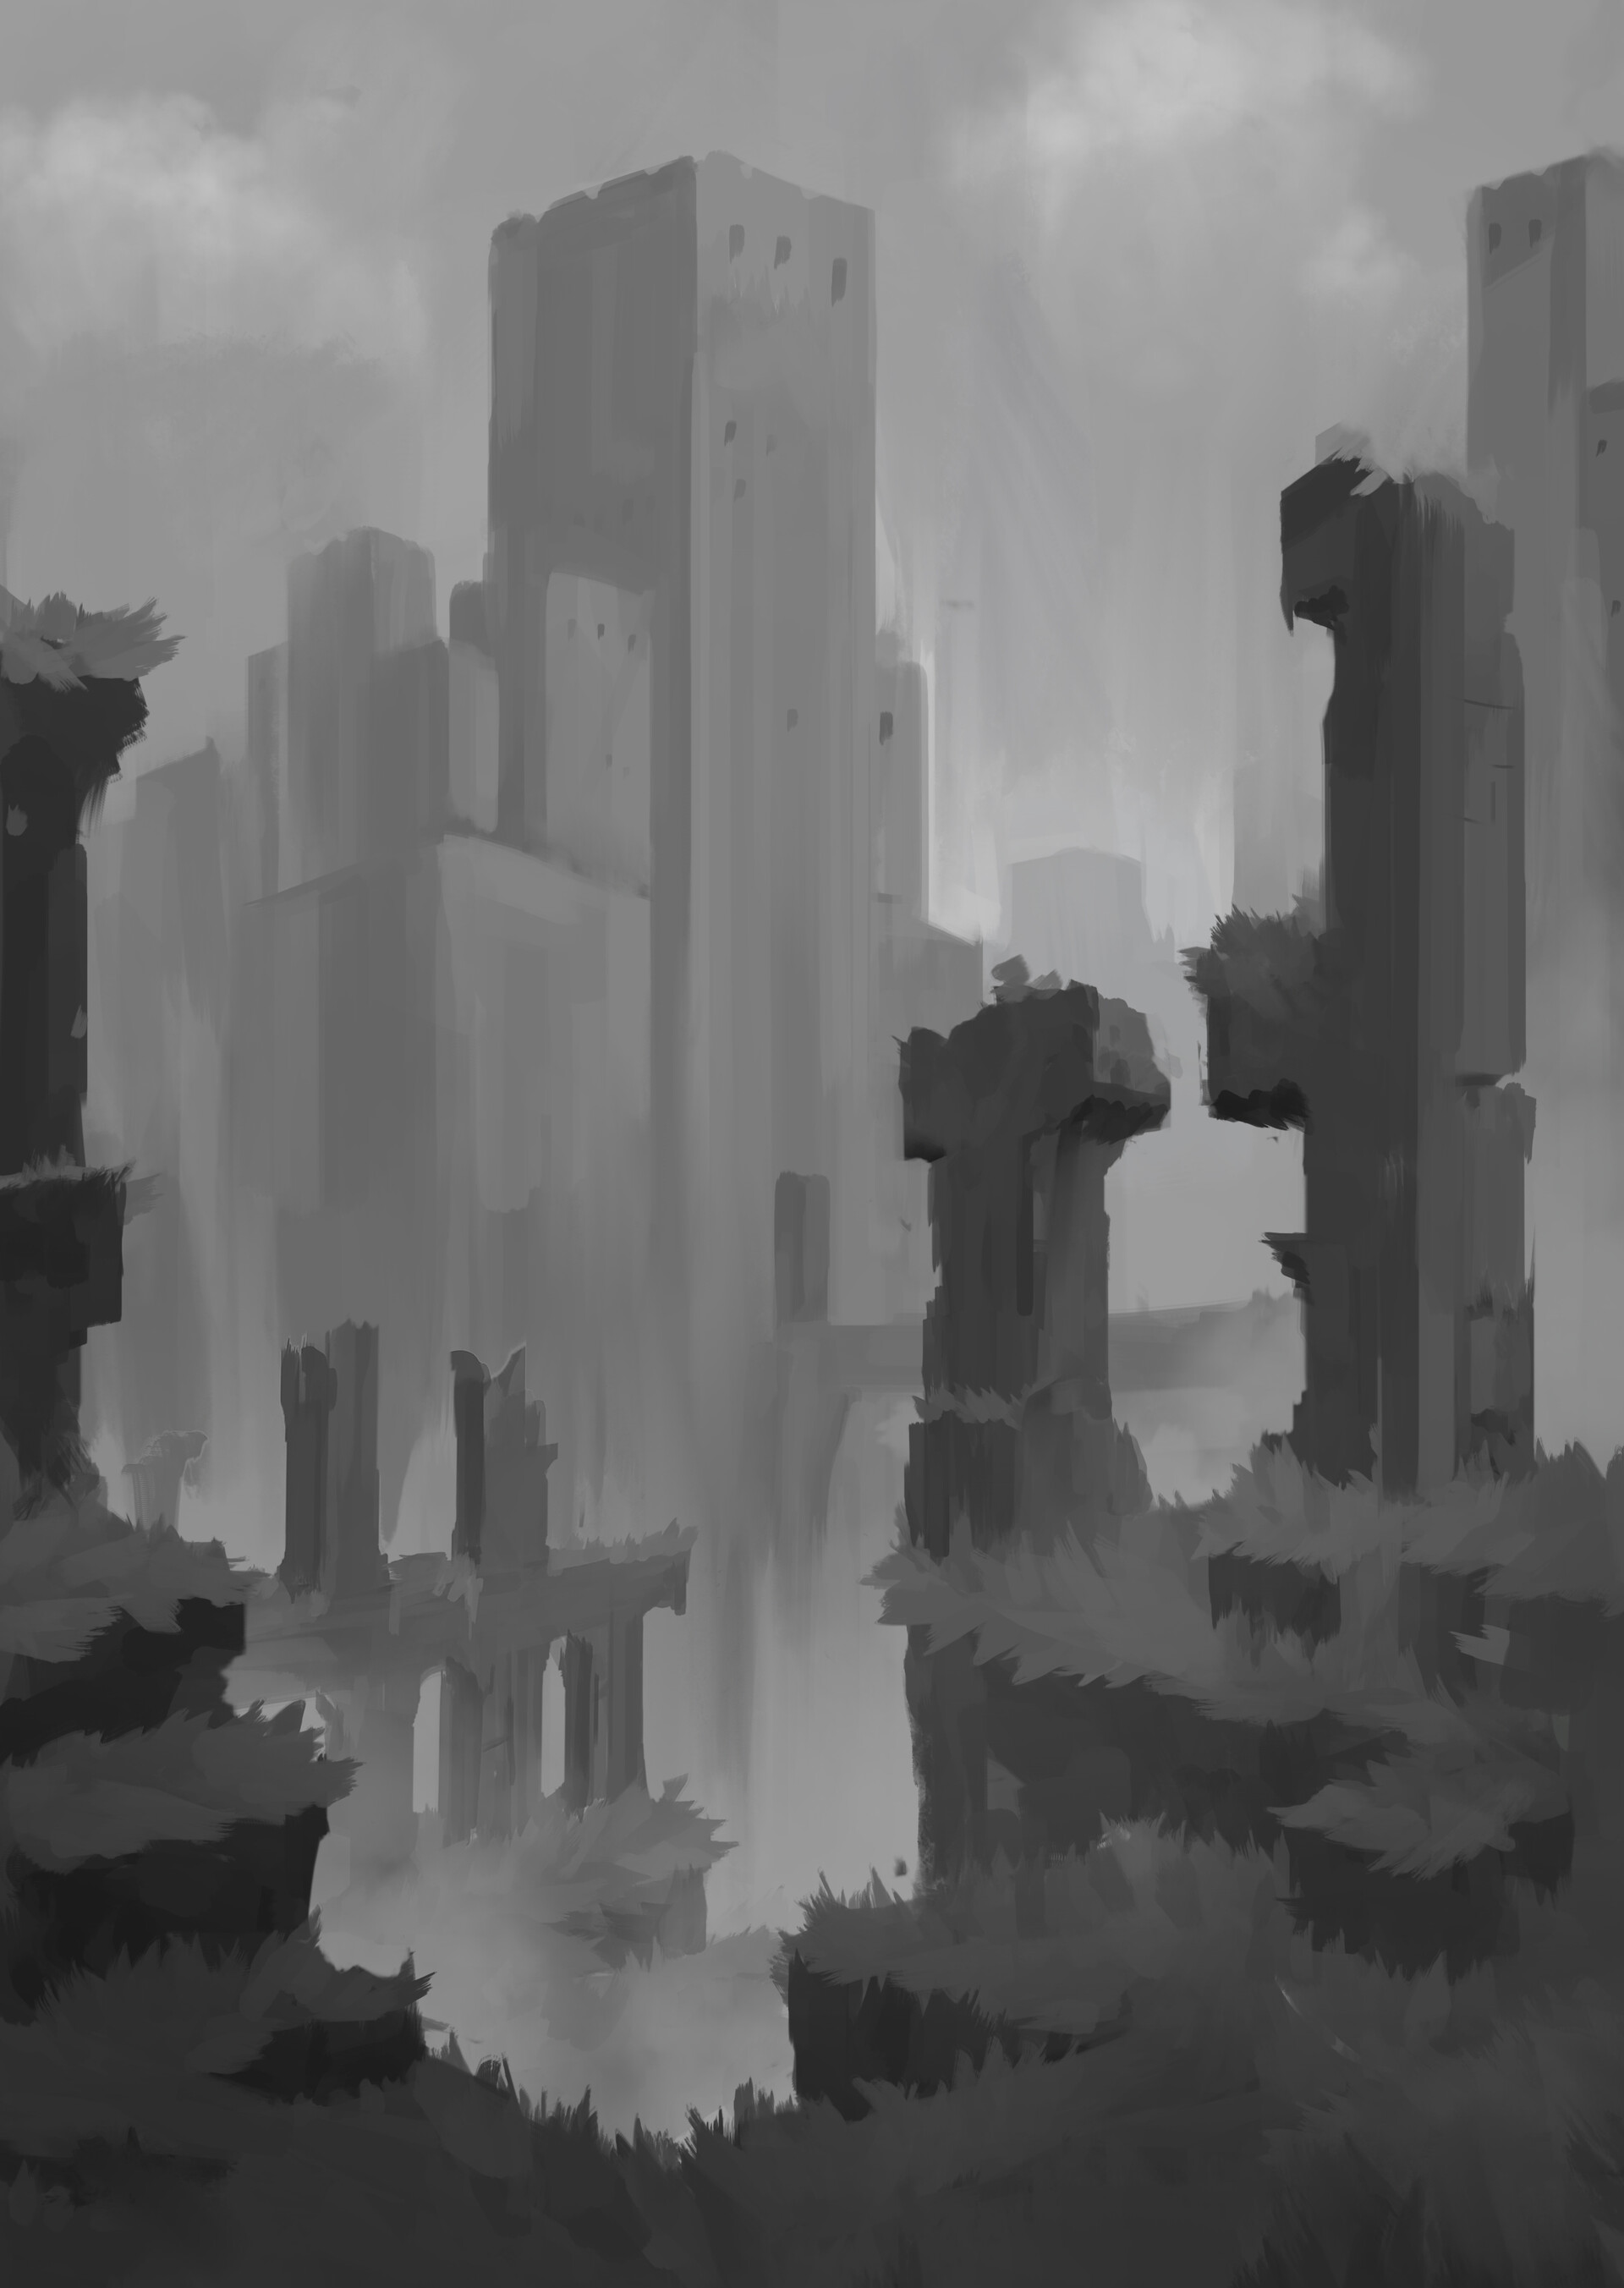 Arnesson art thomas hugo background chapter uno